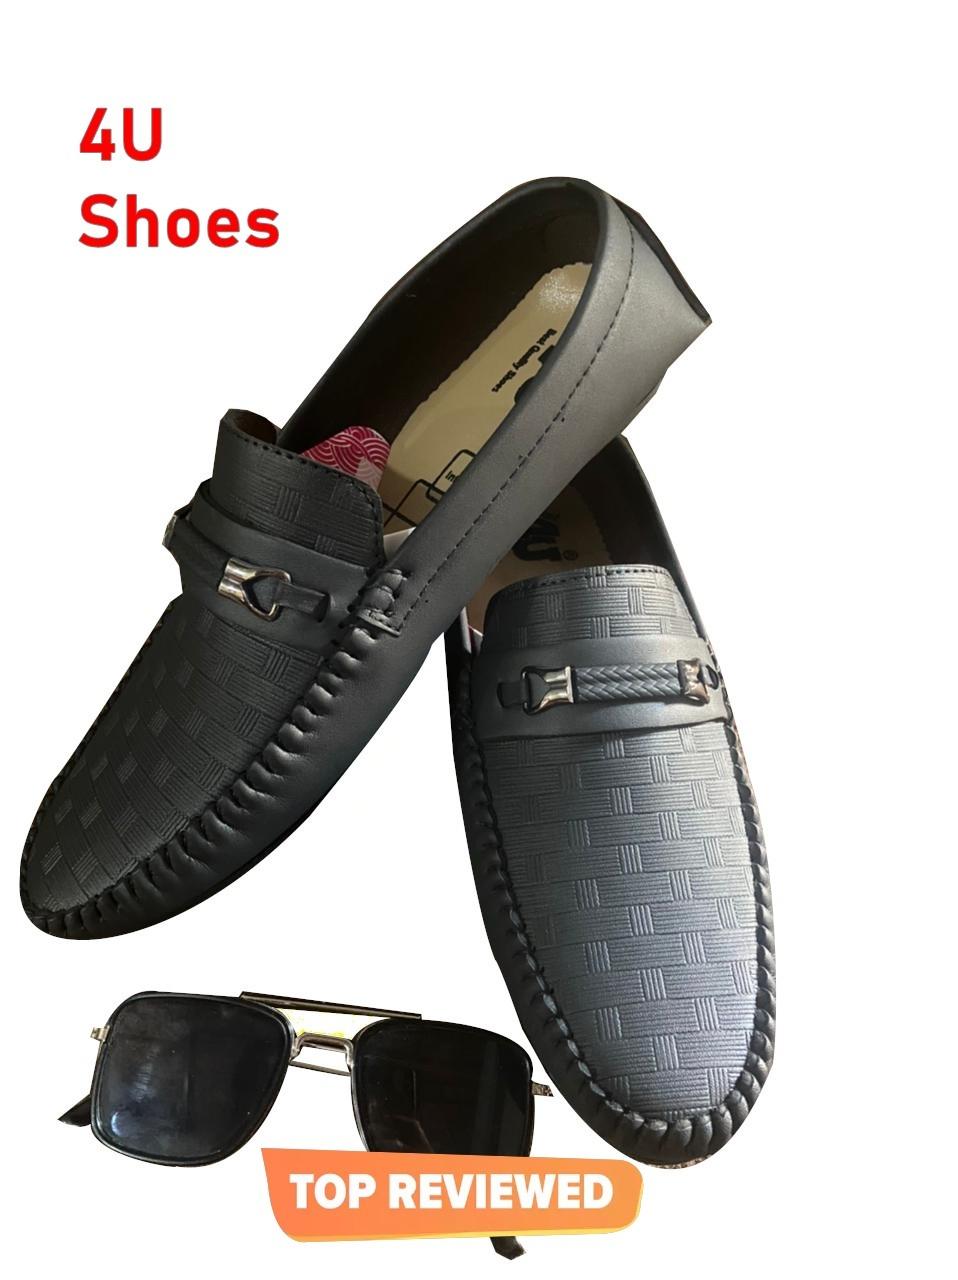 Fashion shoes black mozza # slip ons # loafer shoes black moza black formal shoes